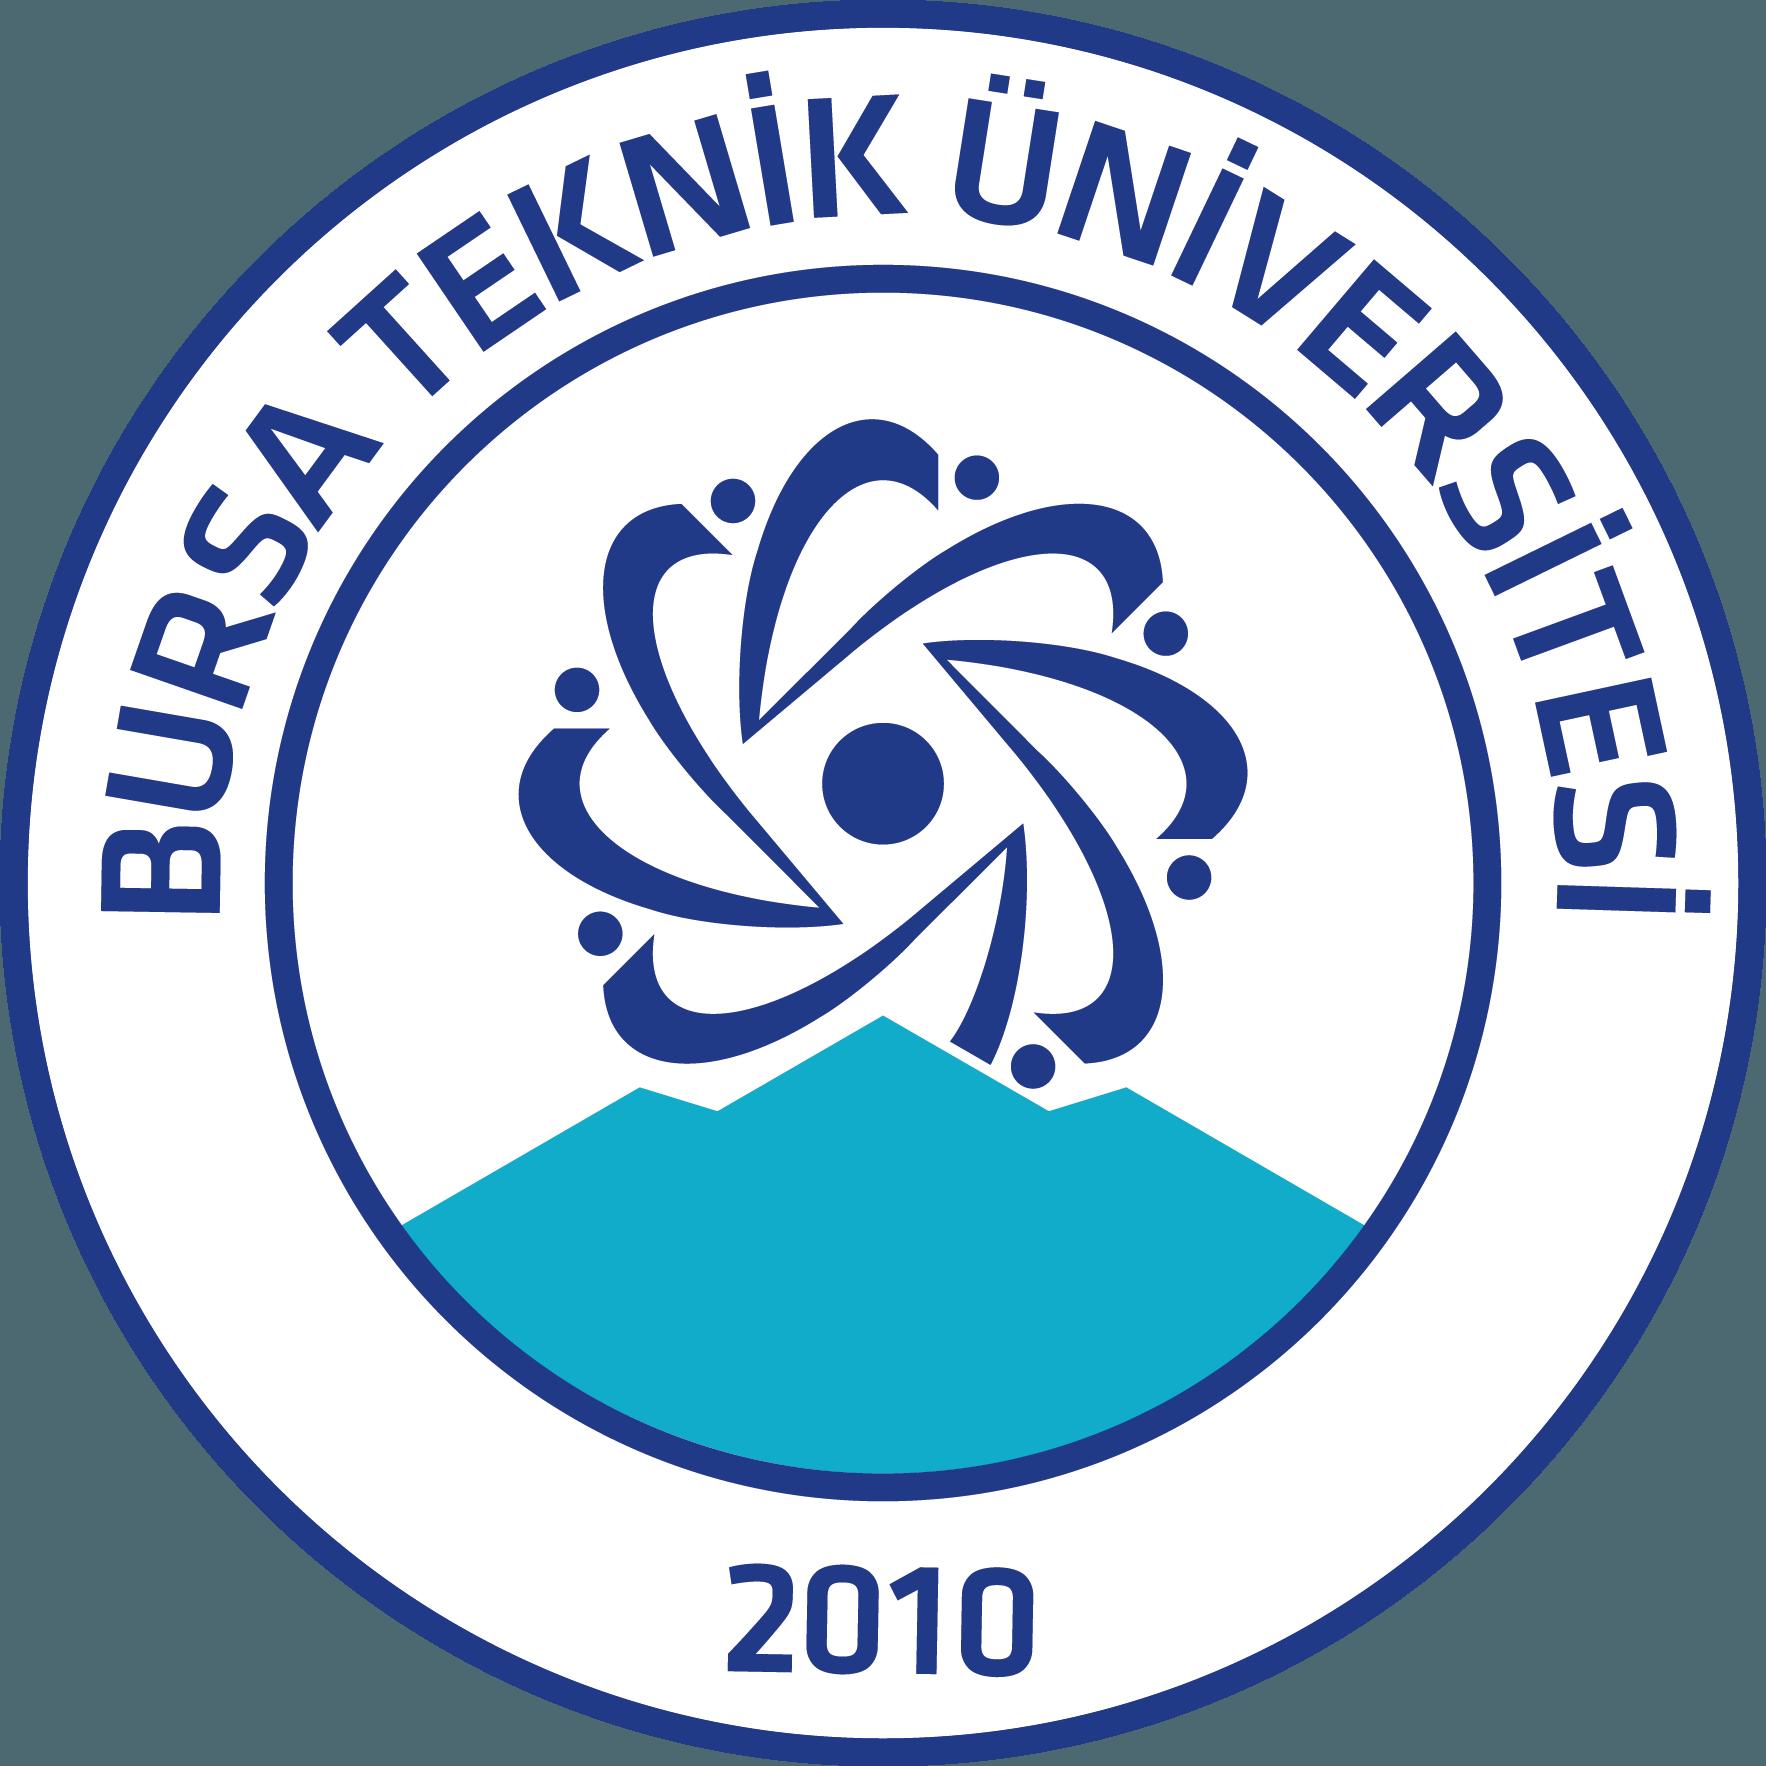 Bursa Teknik Üniversitesi Logo   Arma png